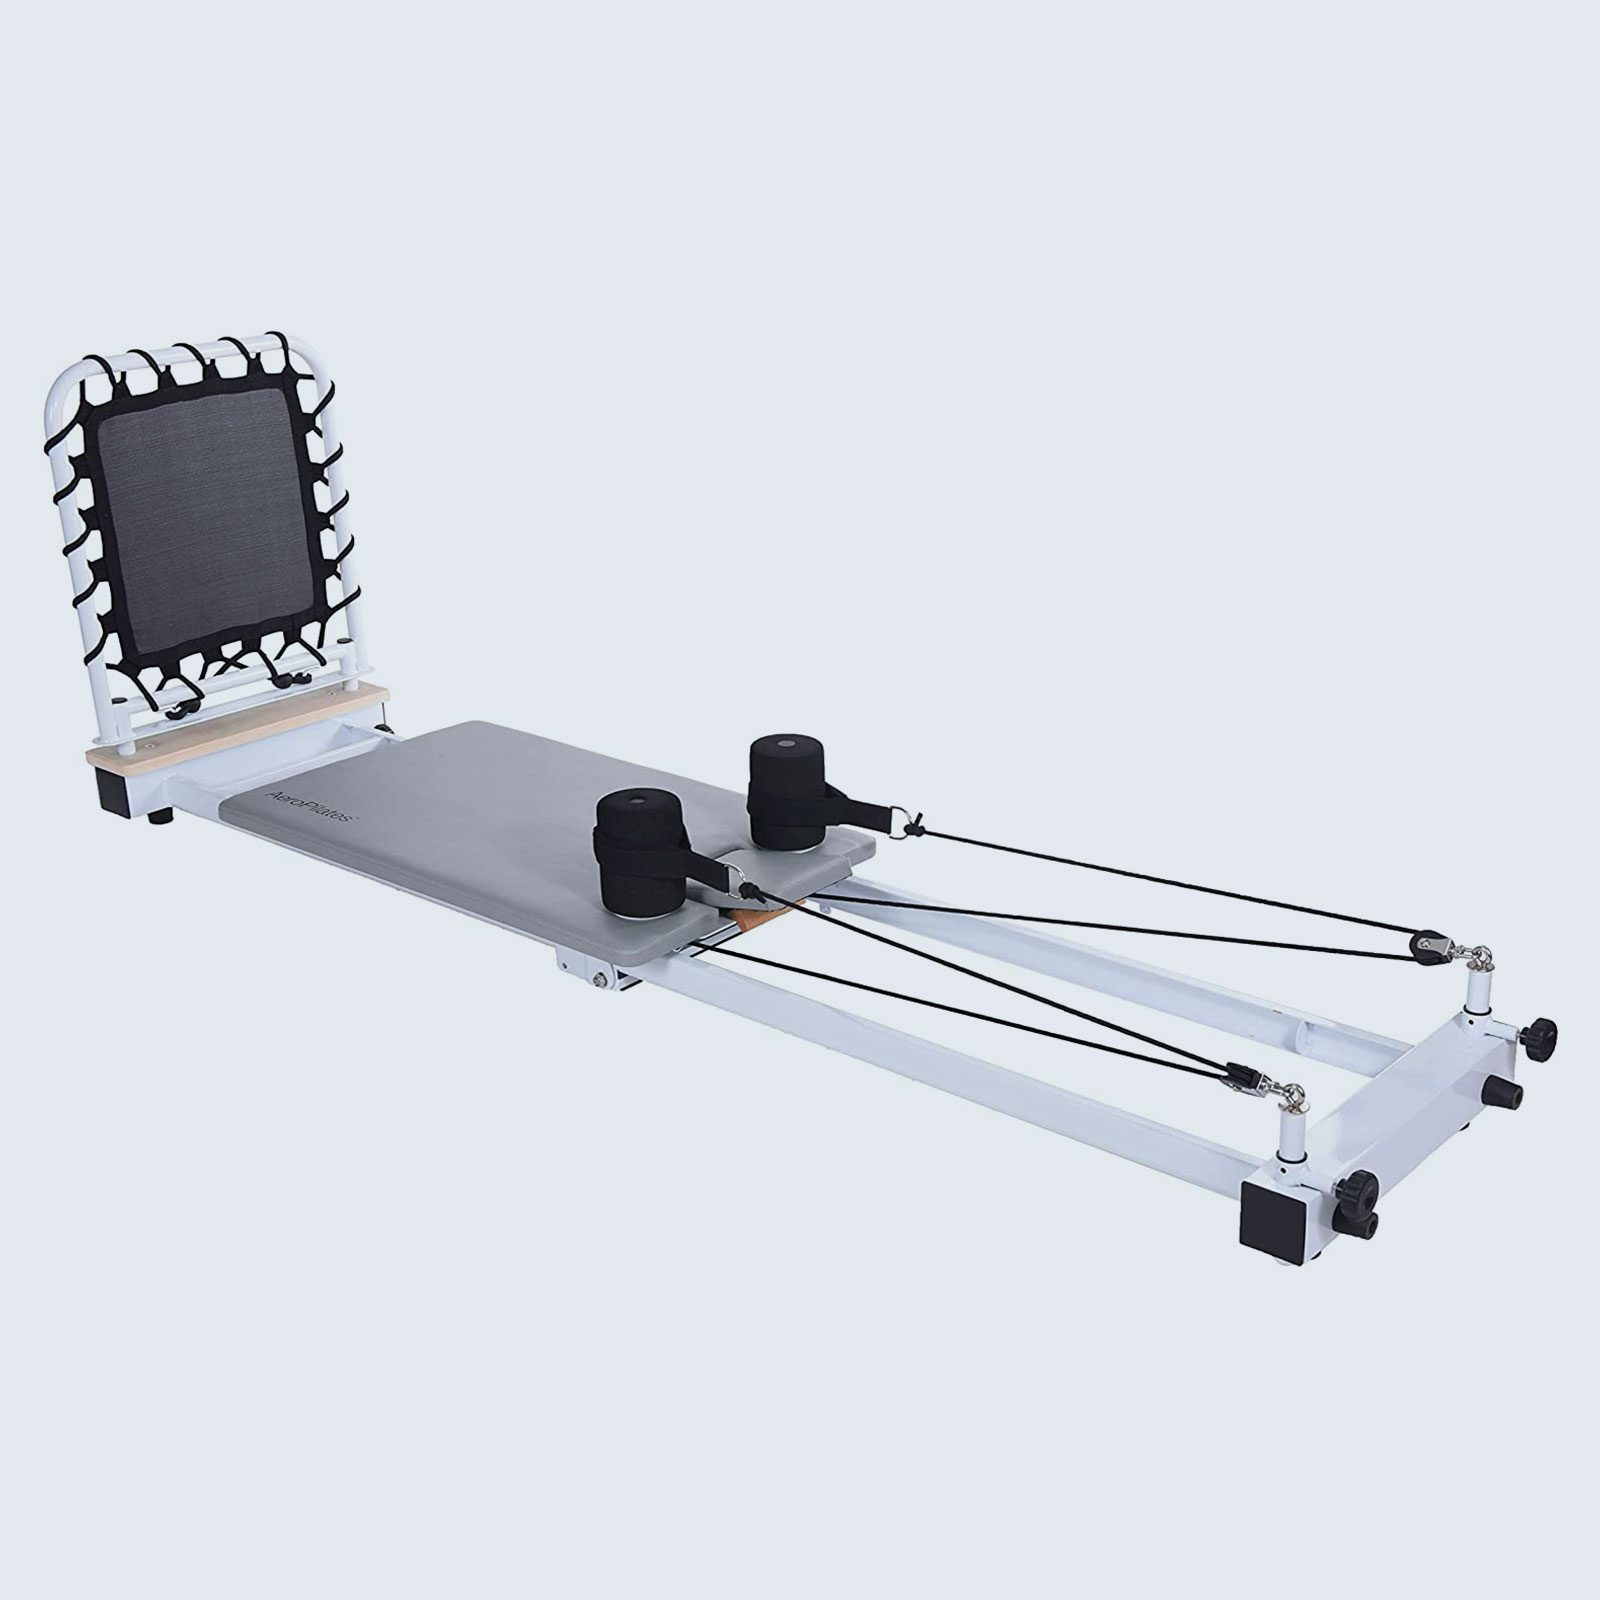 For the fitness fanatic: AeroPilates Precision Series Reformer 535